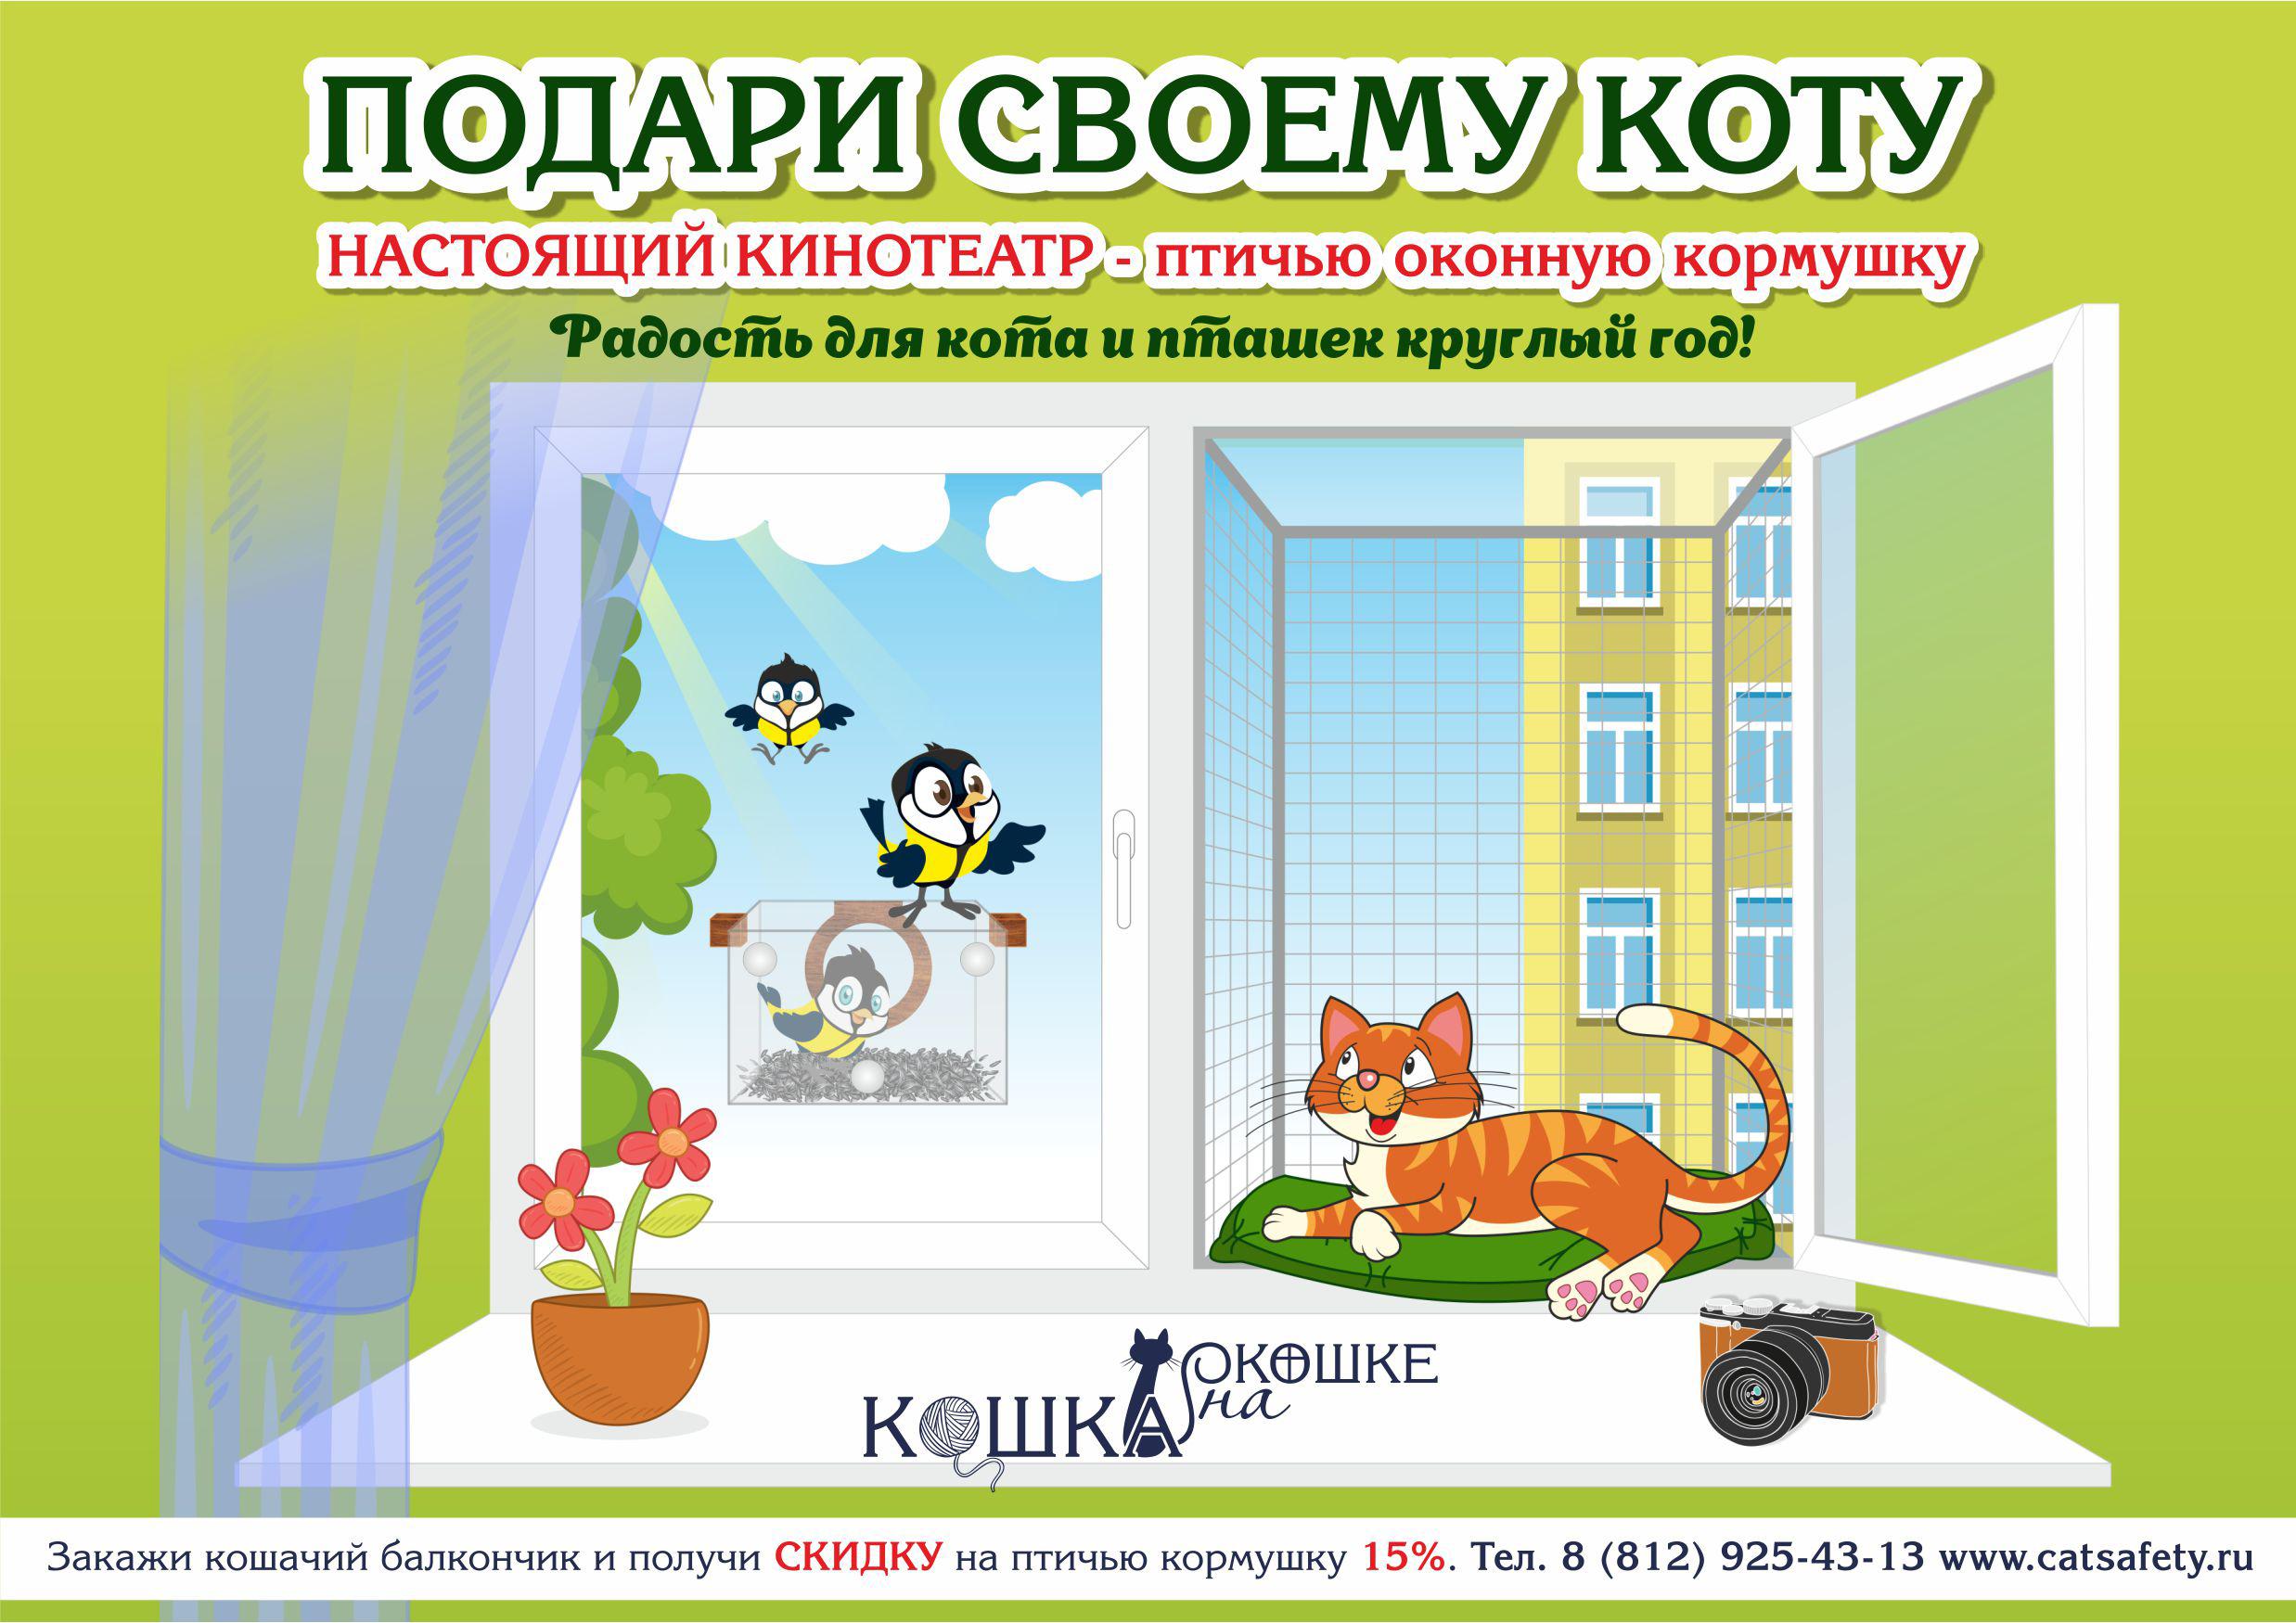 антикошка кошачий балкон вольер зн окно вольер за окно птичья кормушка